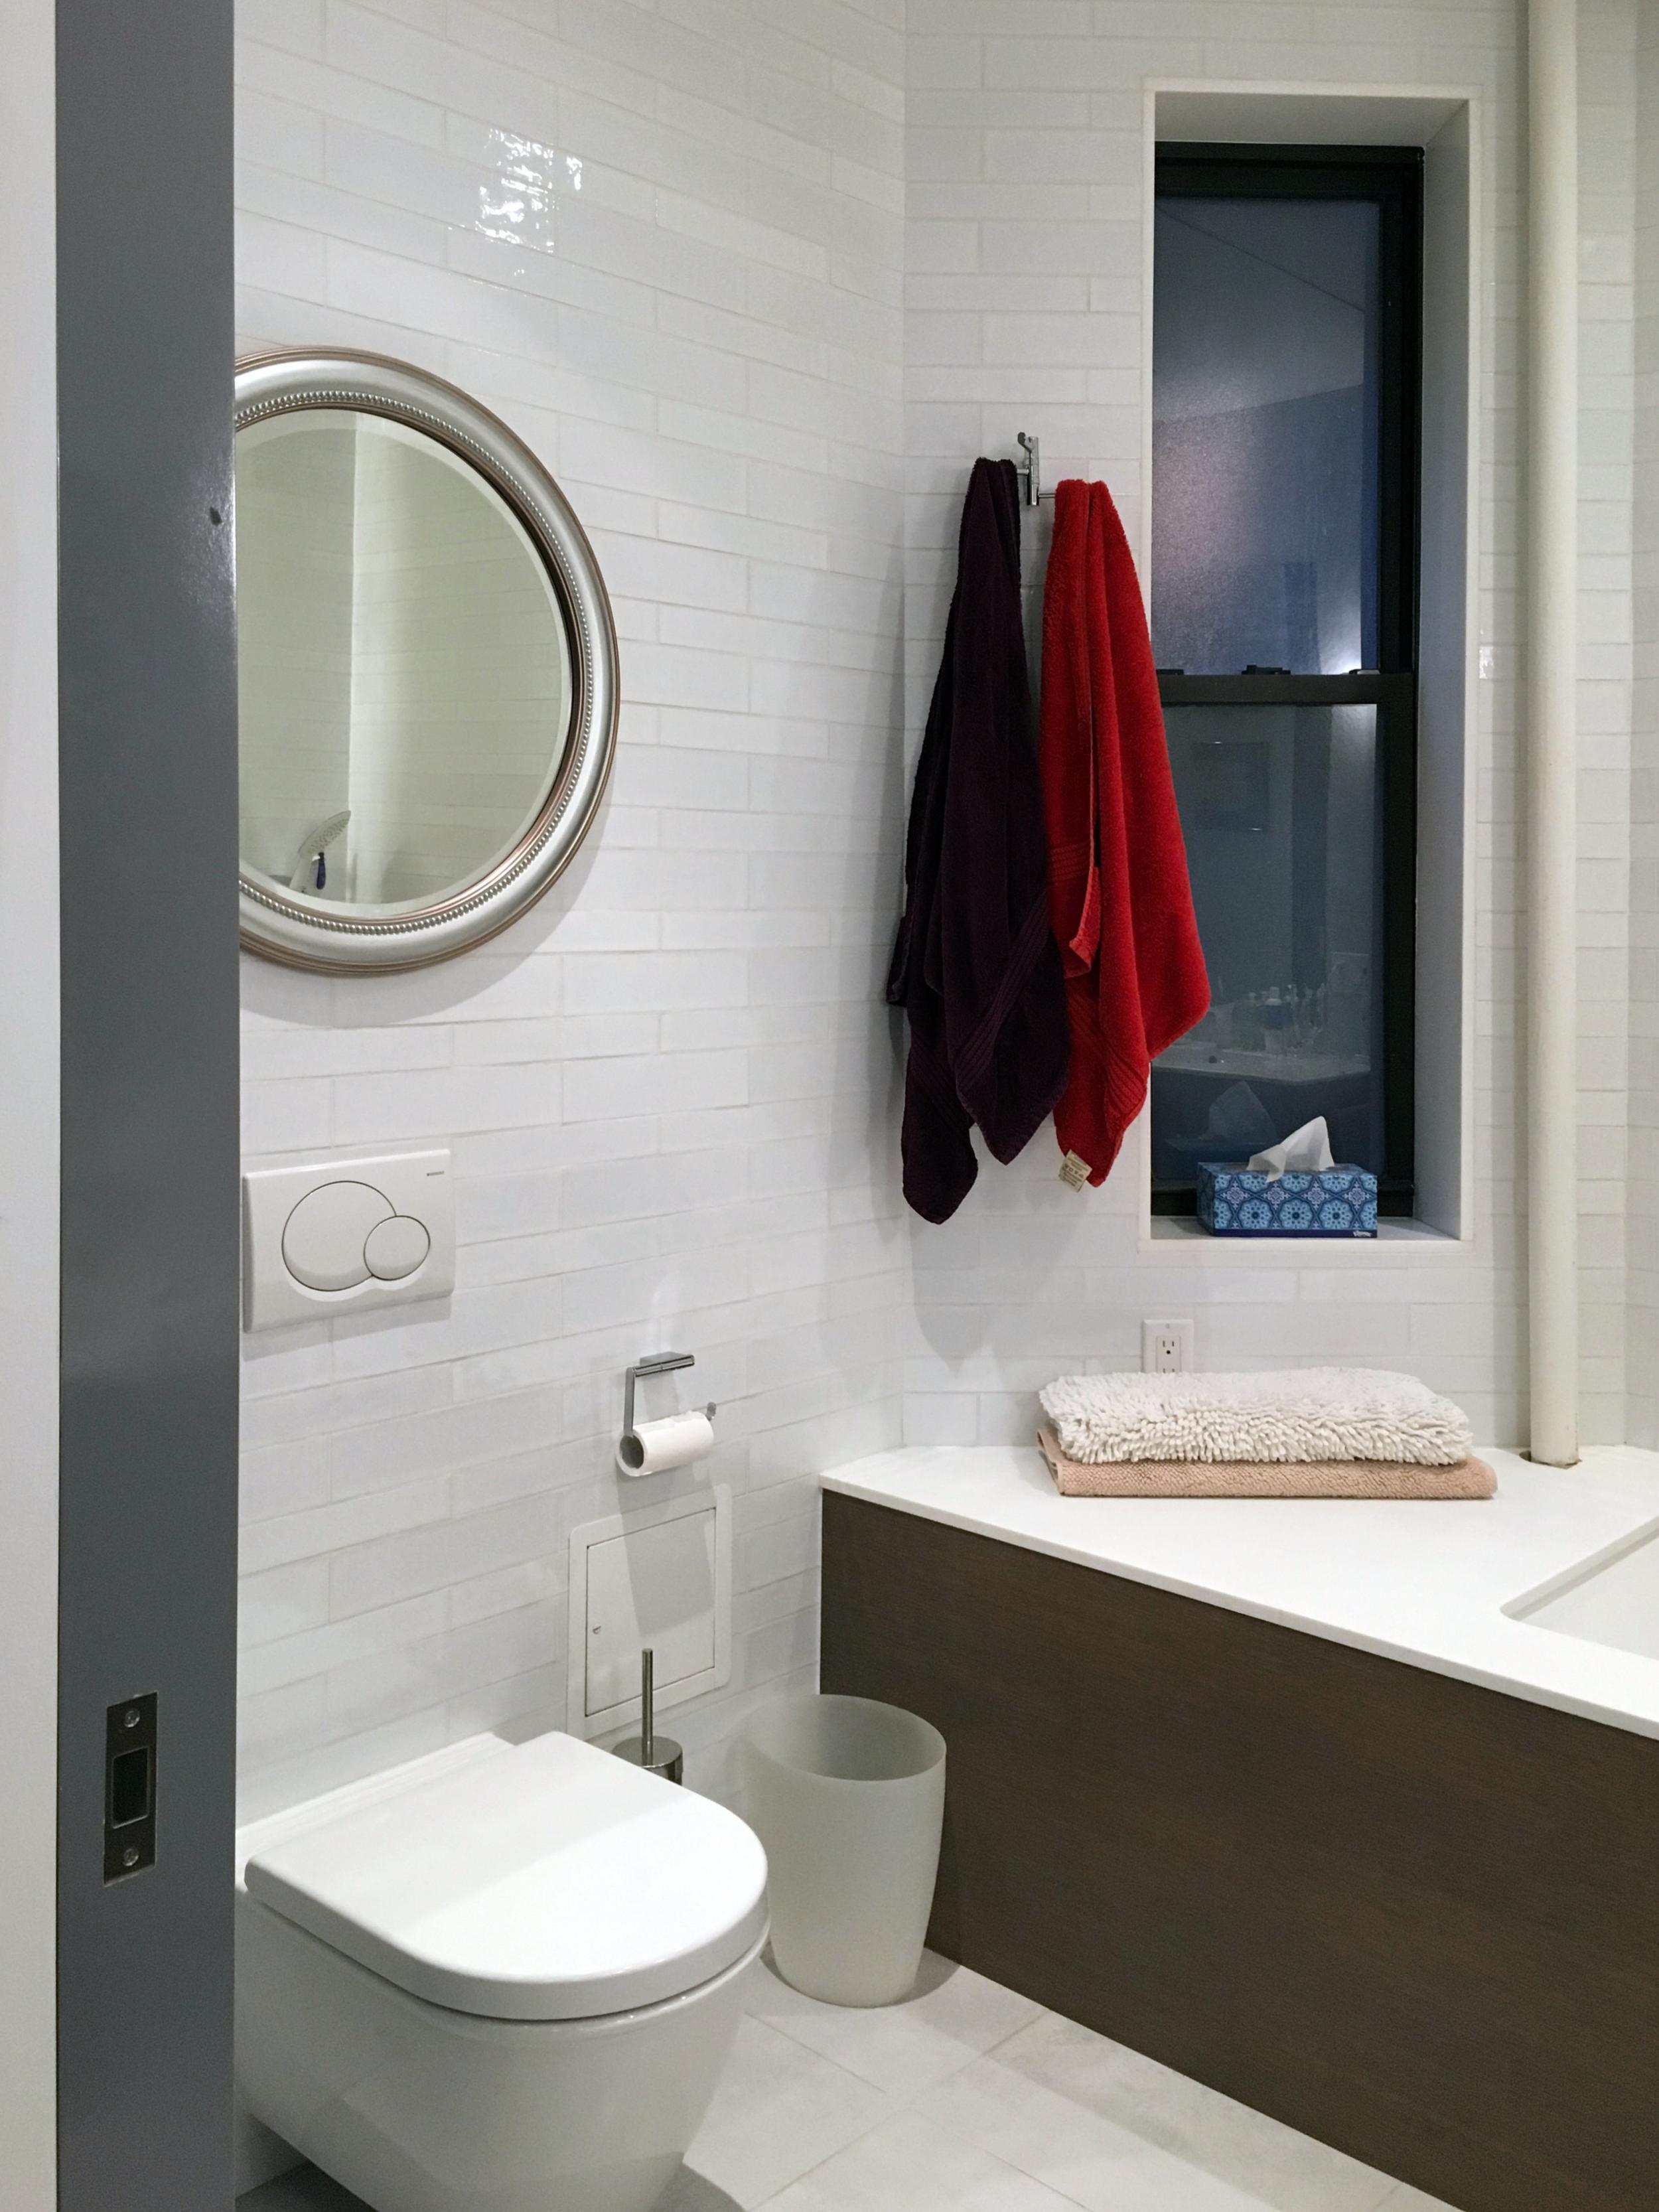 ApartmentNY (8).jpg